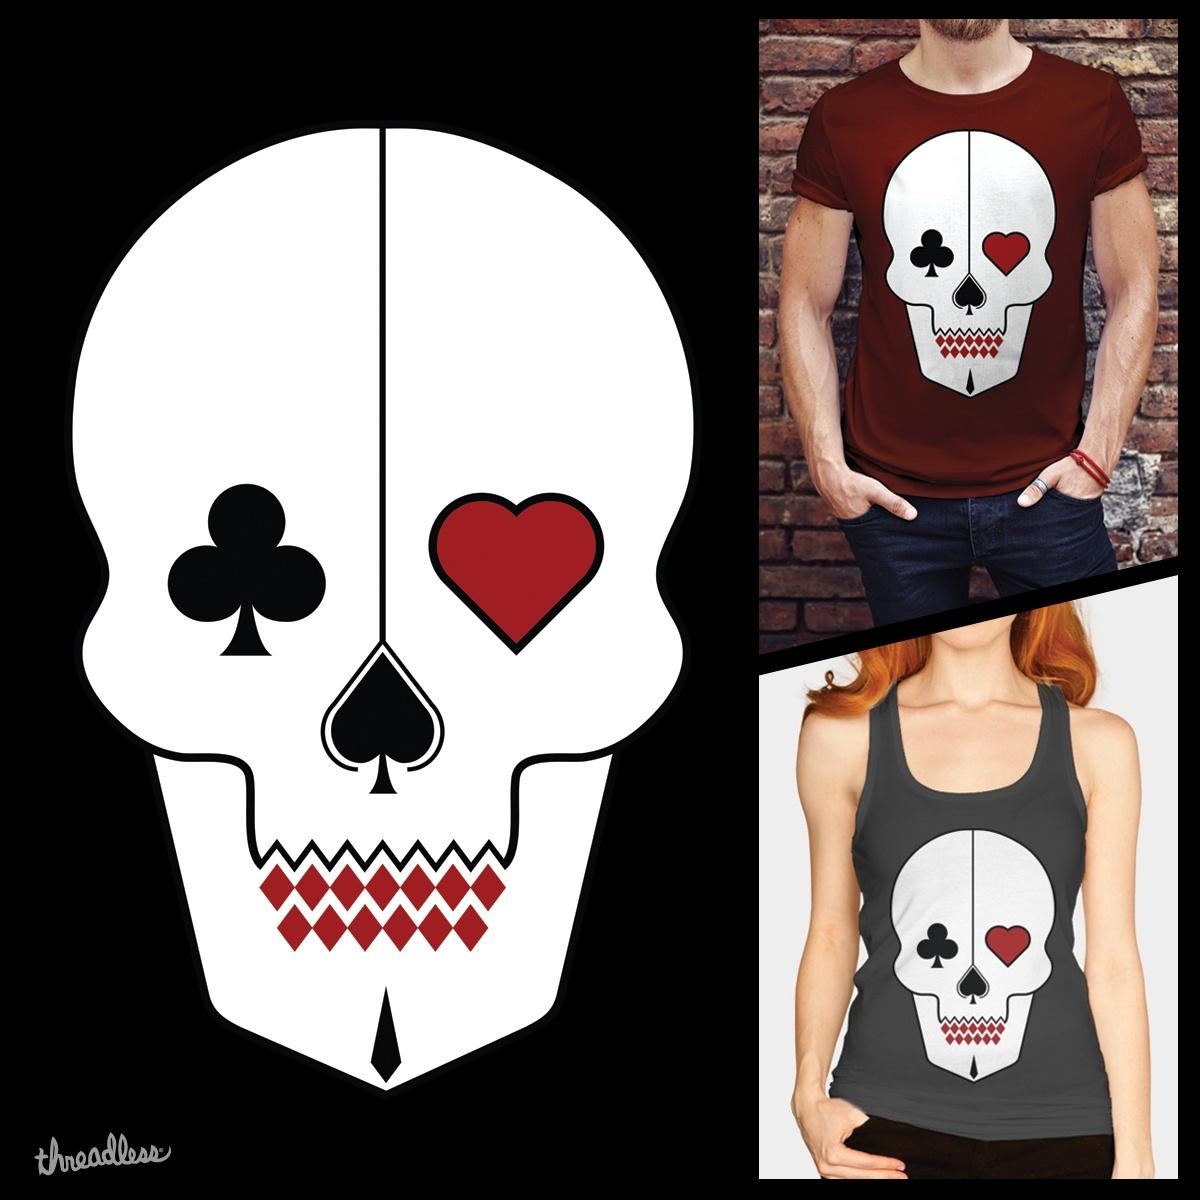 Skull Cards by FranValleArt on Threadless